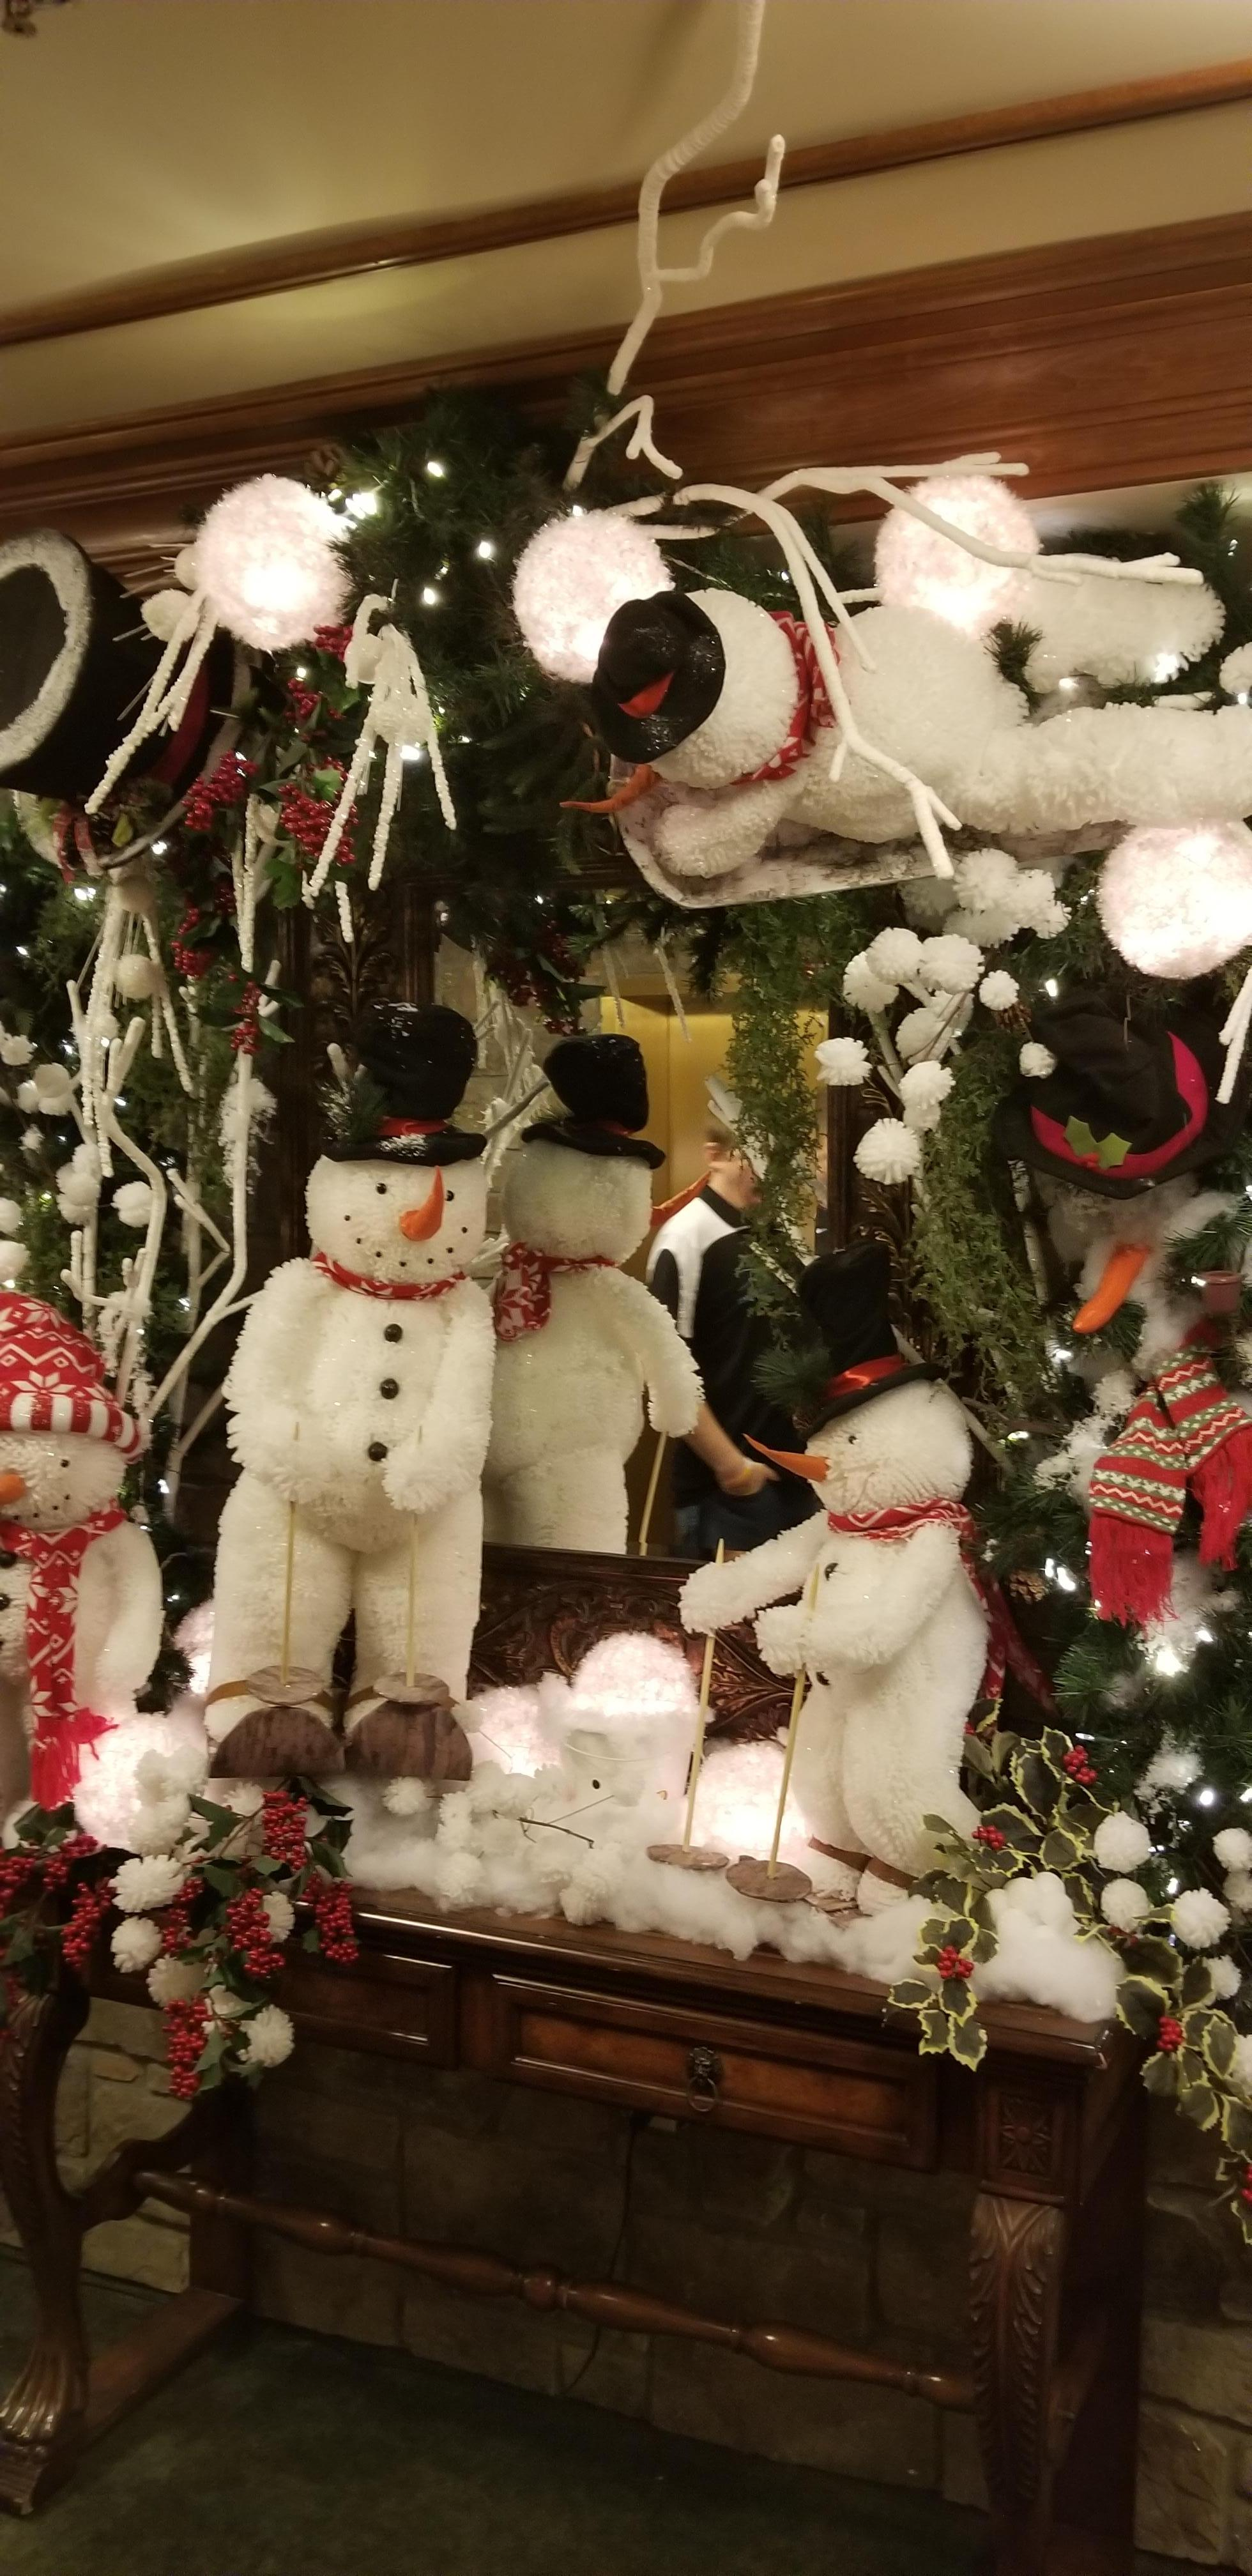 Christmas Motel Pigeon Forge Tn.The Inn At Christmas Place Gatlinburg Pigeon Forge 2019